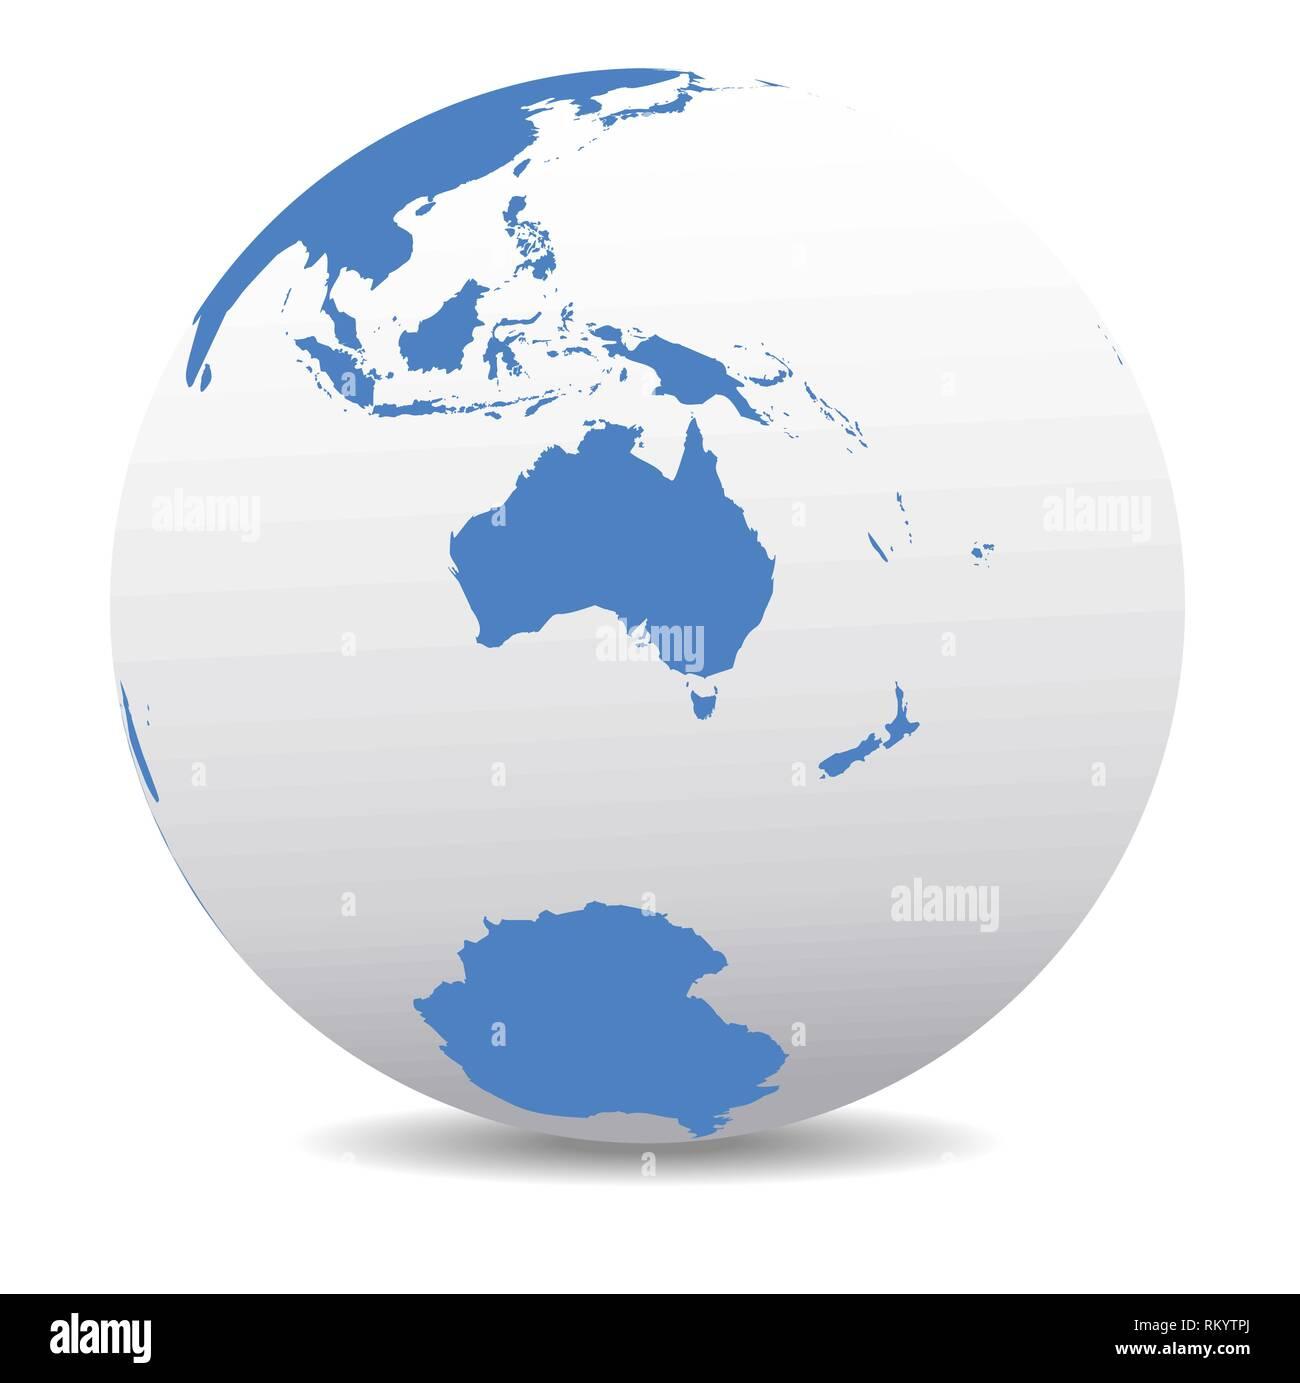 Australia and New Zealand, South Pole, Antarctica, Global ...